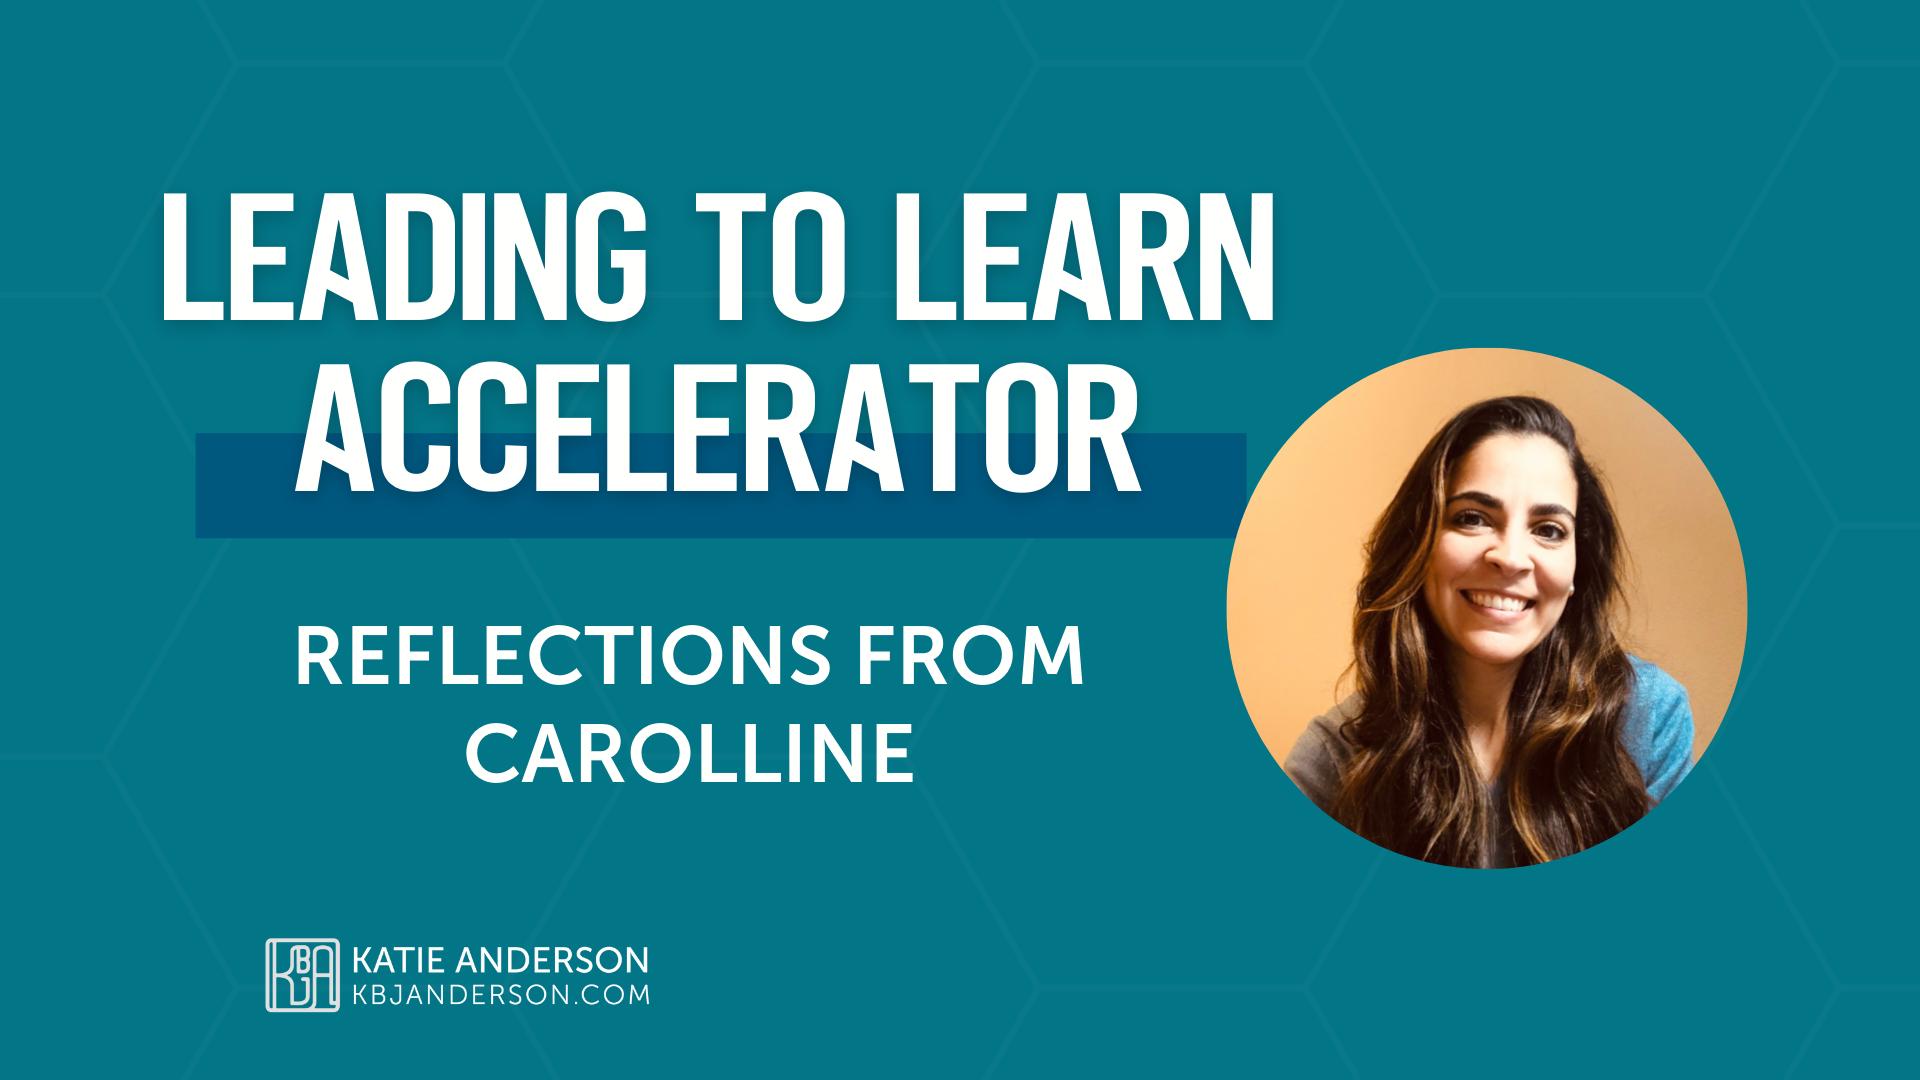 Leading to Learn Accelerator Testimonial with Carolline